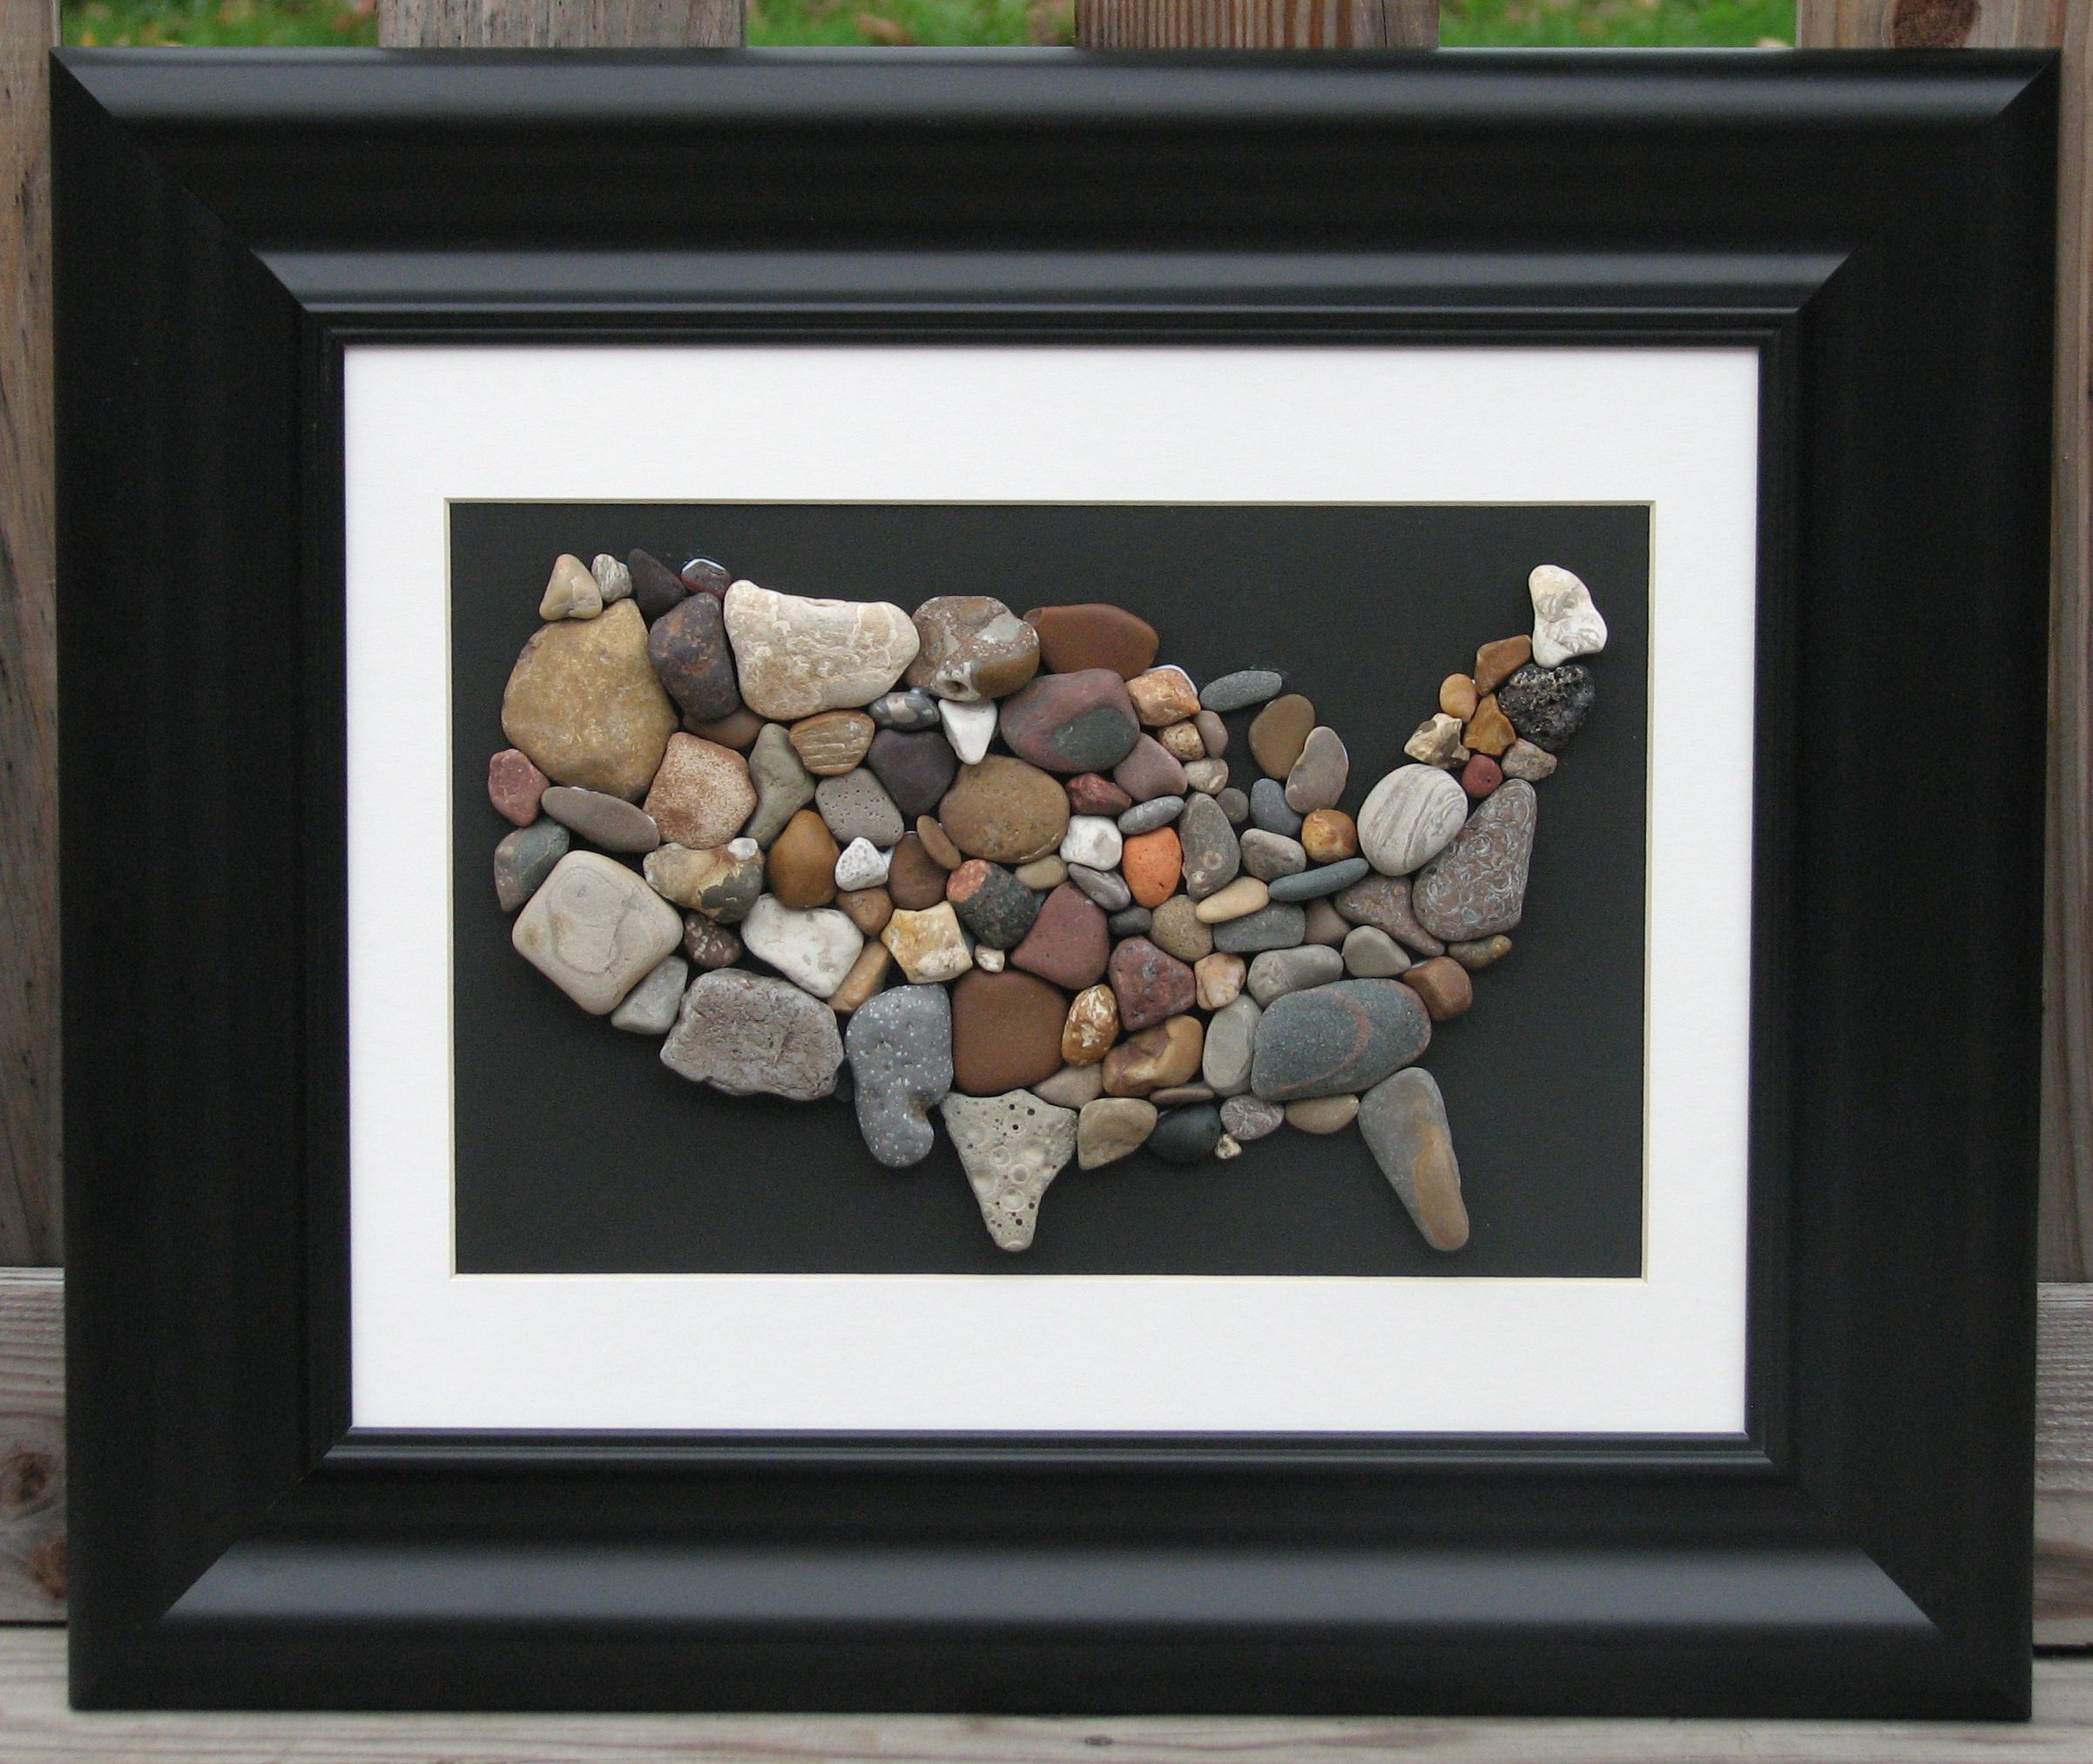 The USA Rocks\